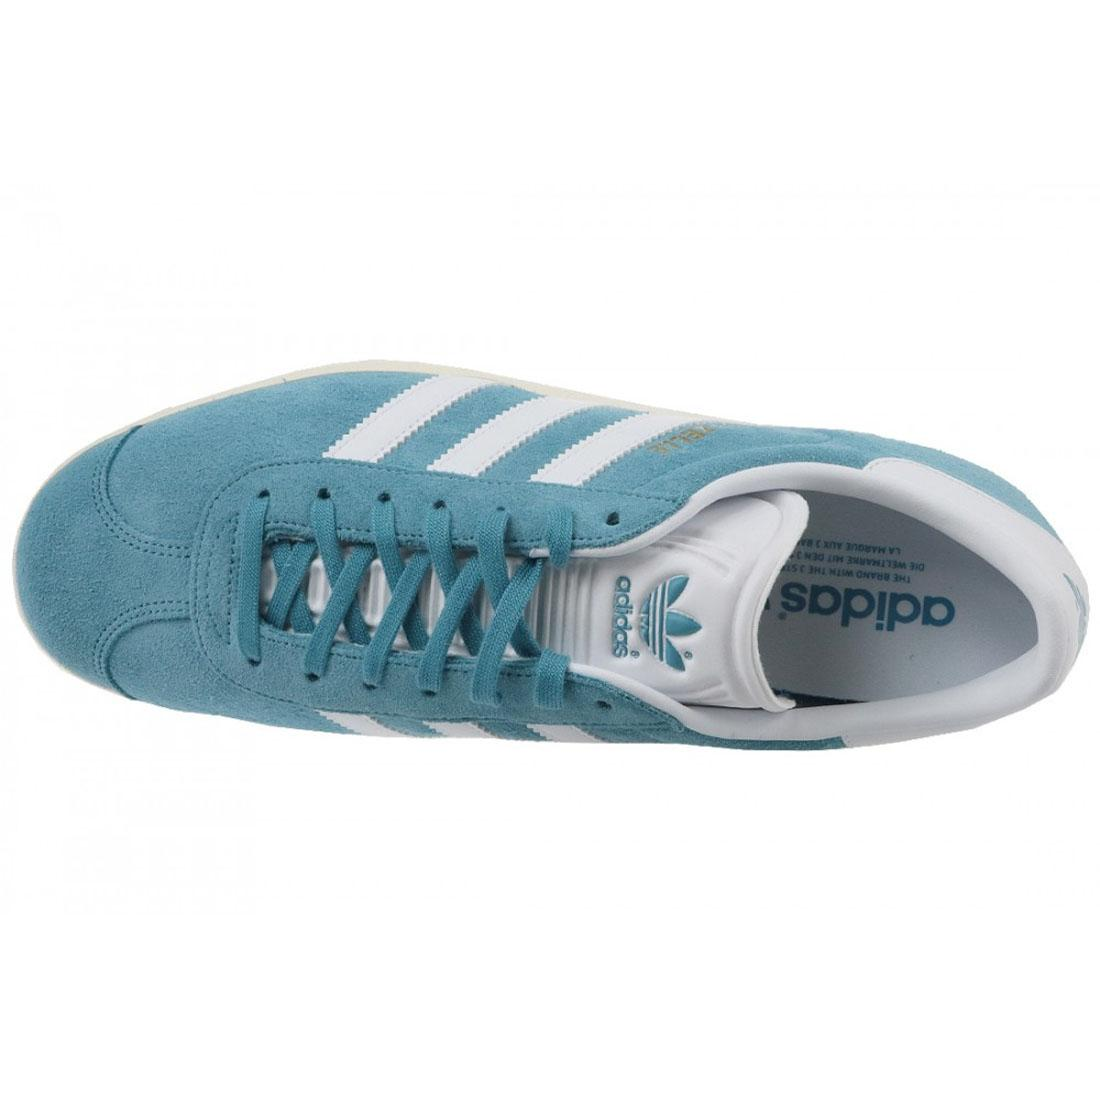 new arrival b1260 00836 Adidas originals Gazelle entrenadores azul blanco para hombre zapatos BZ0022